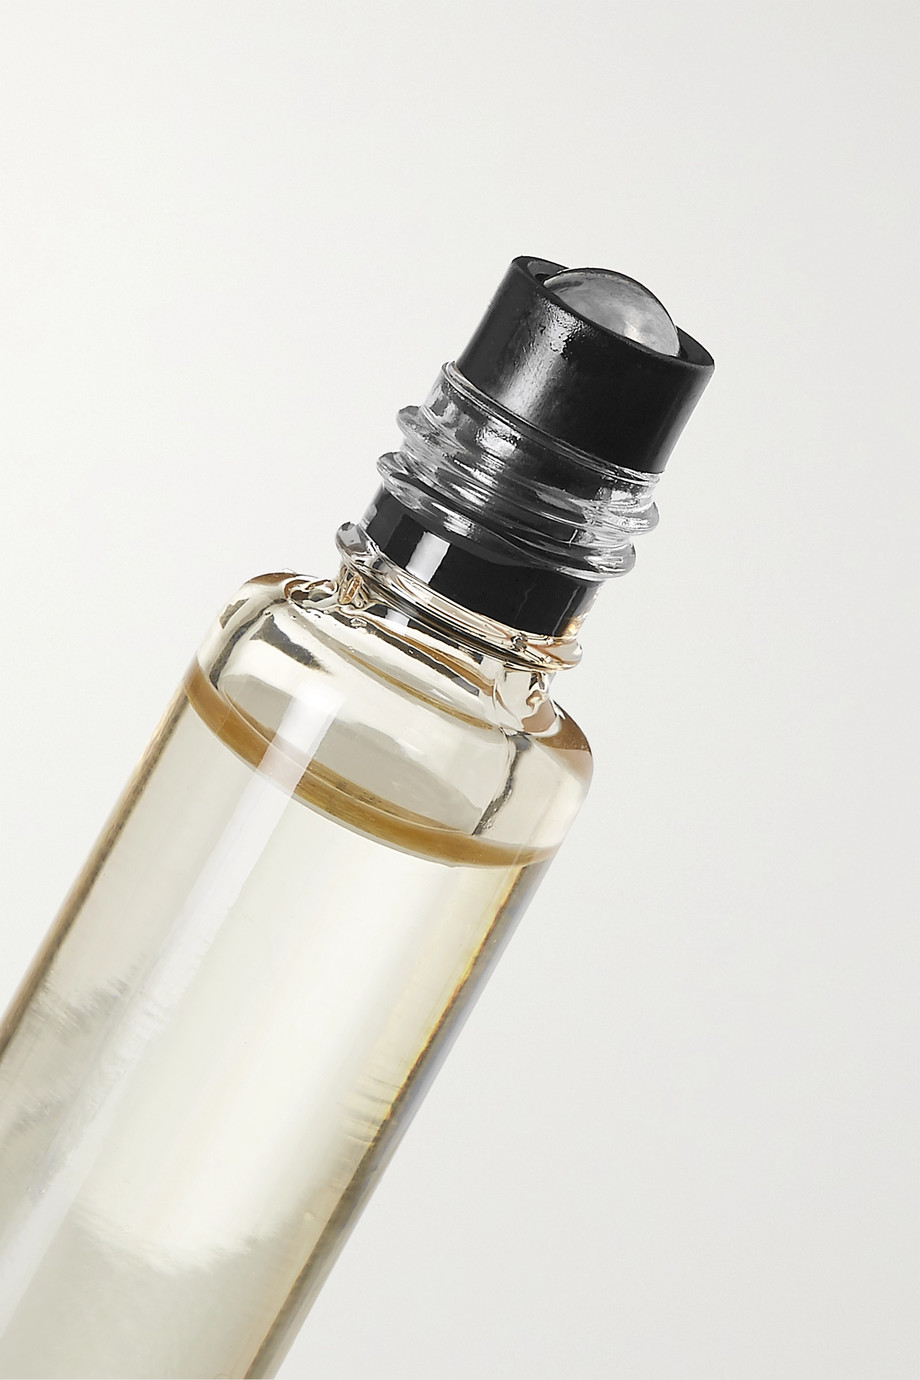 Byredo Blanche, 7,5ml – Roll-on-Parfumöl